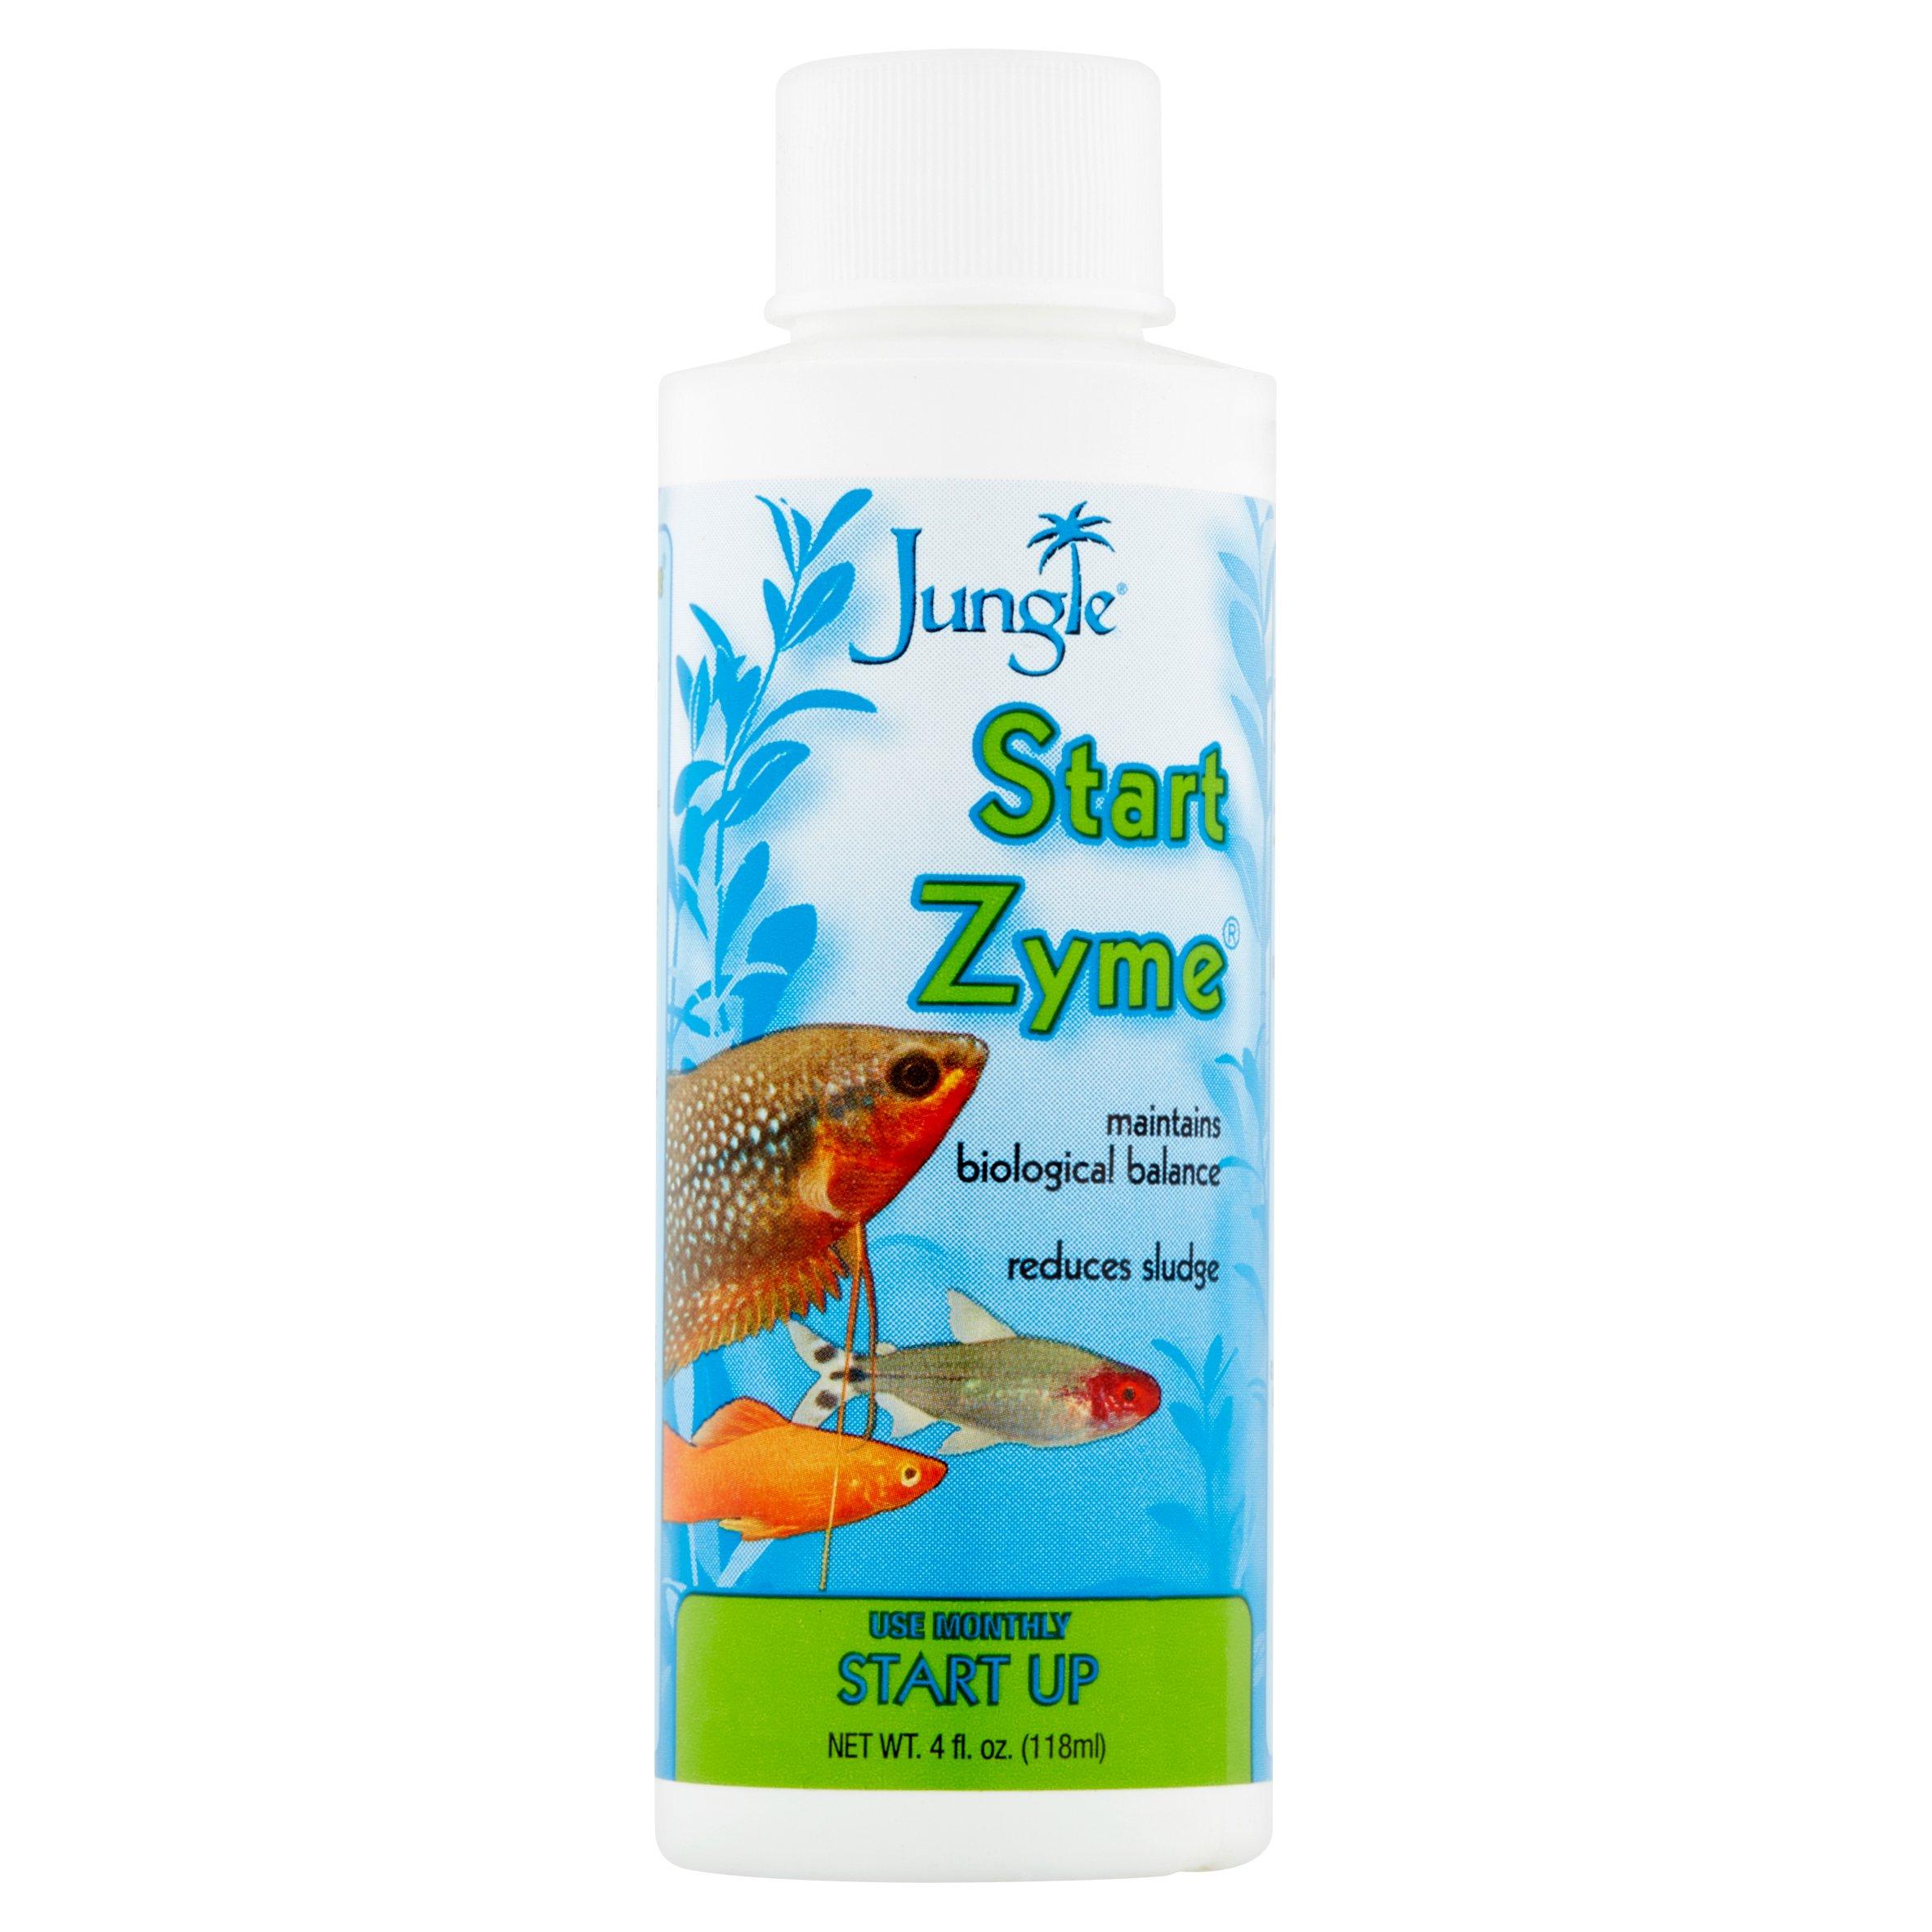 Jungle Start Zyme, 4 fl oz